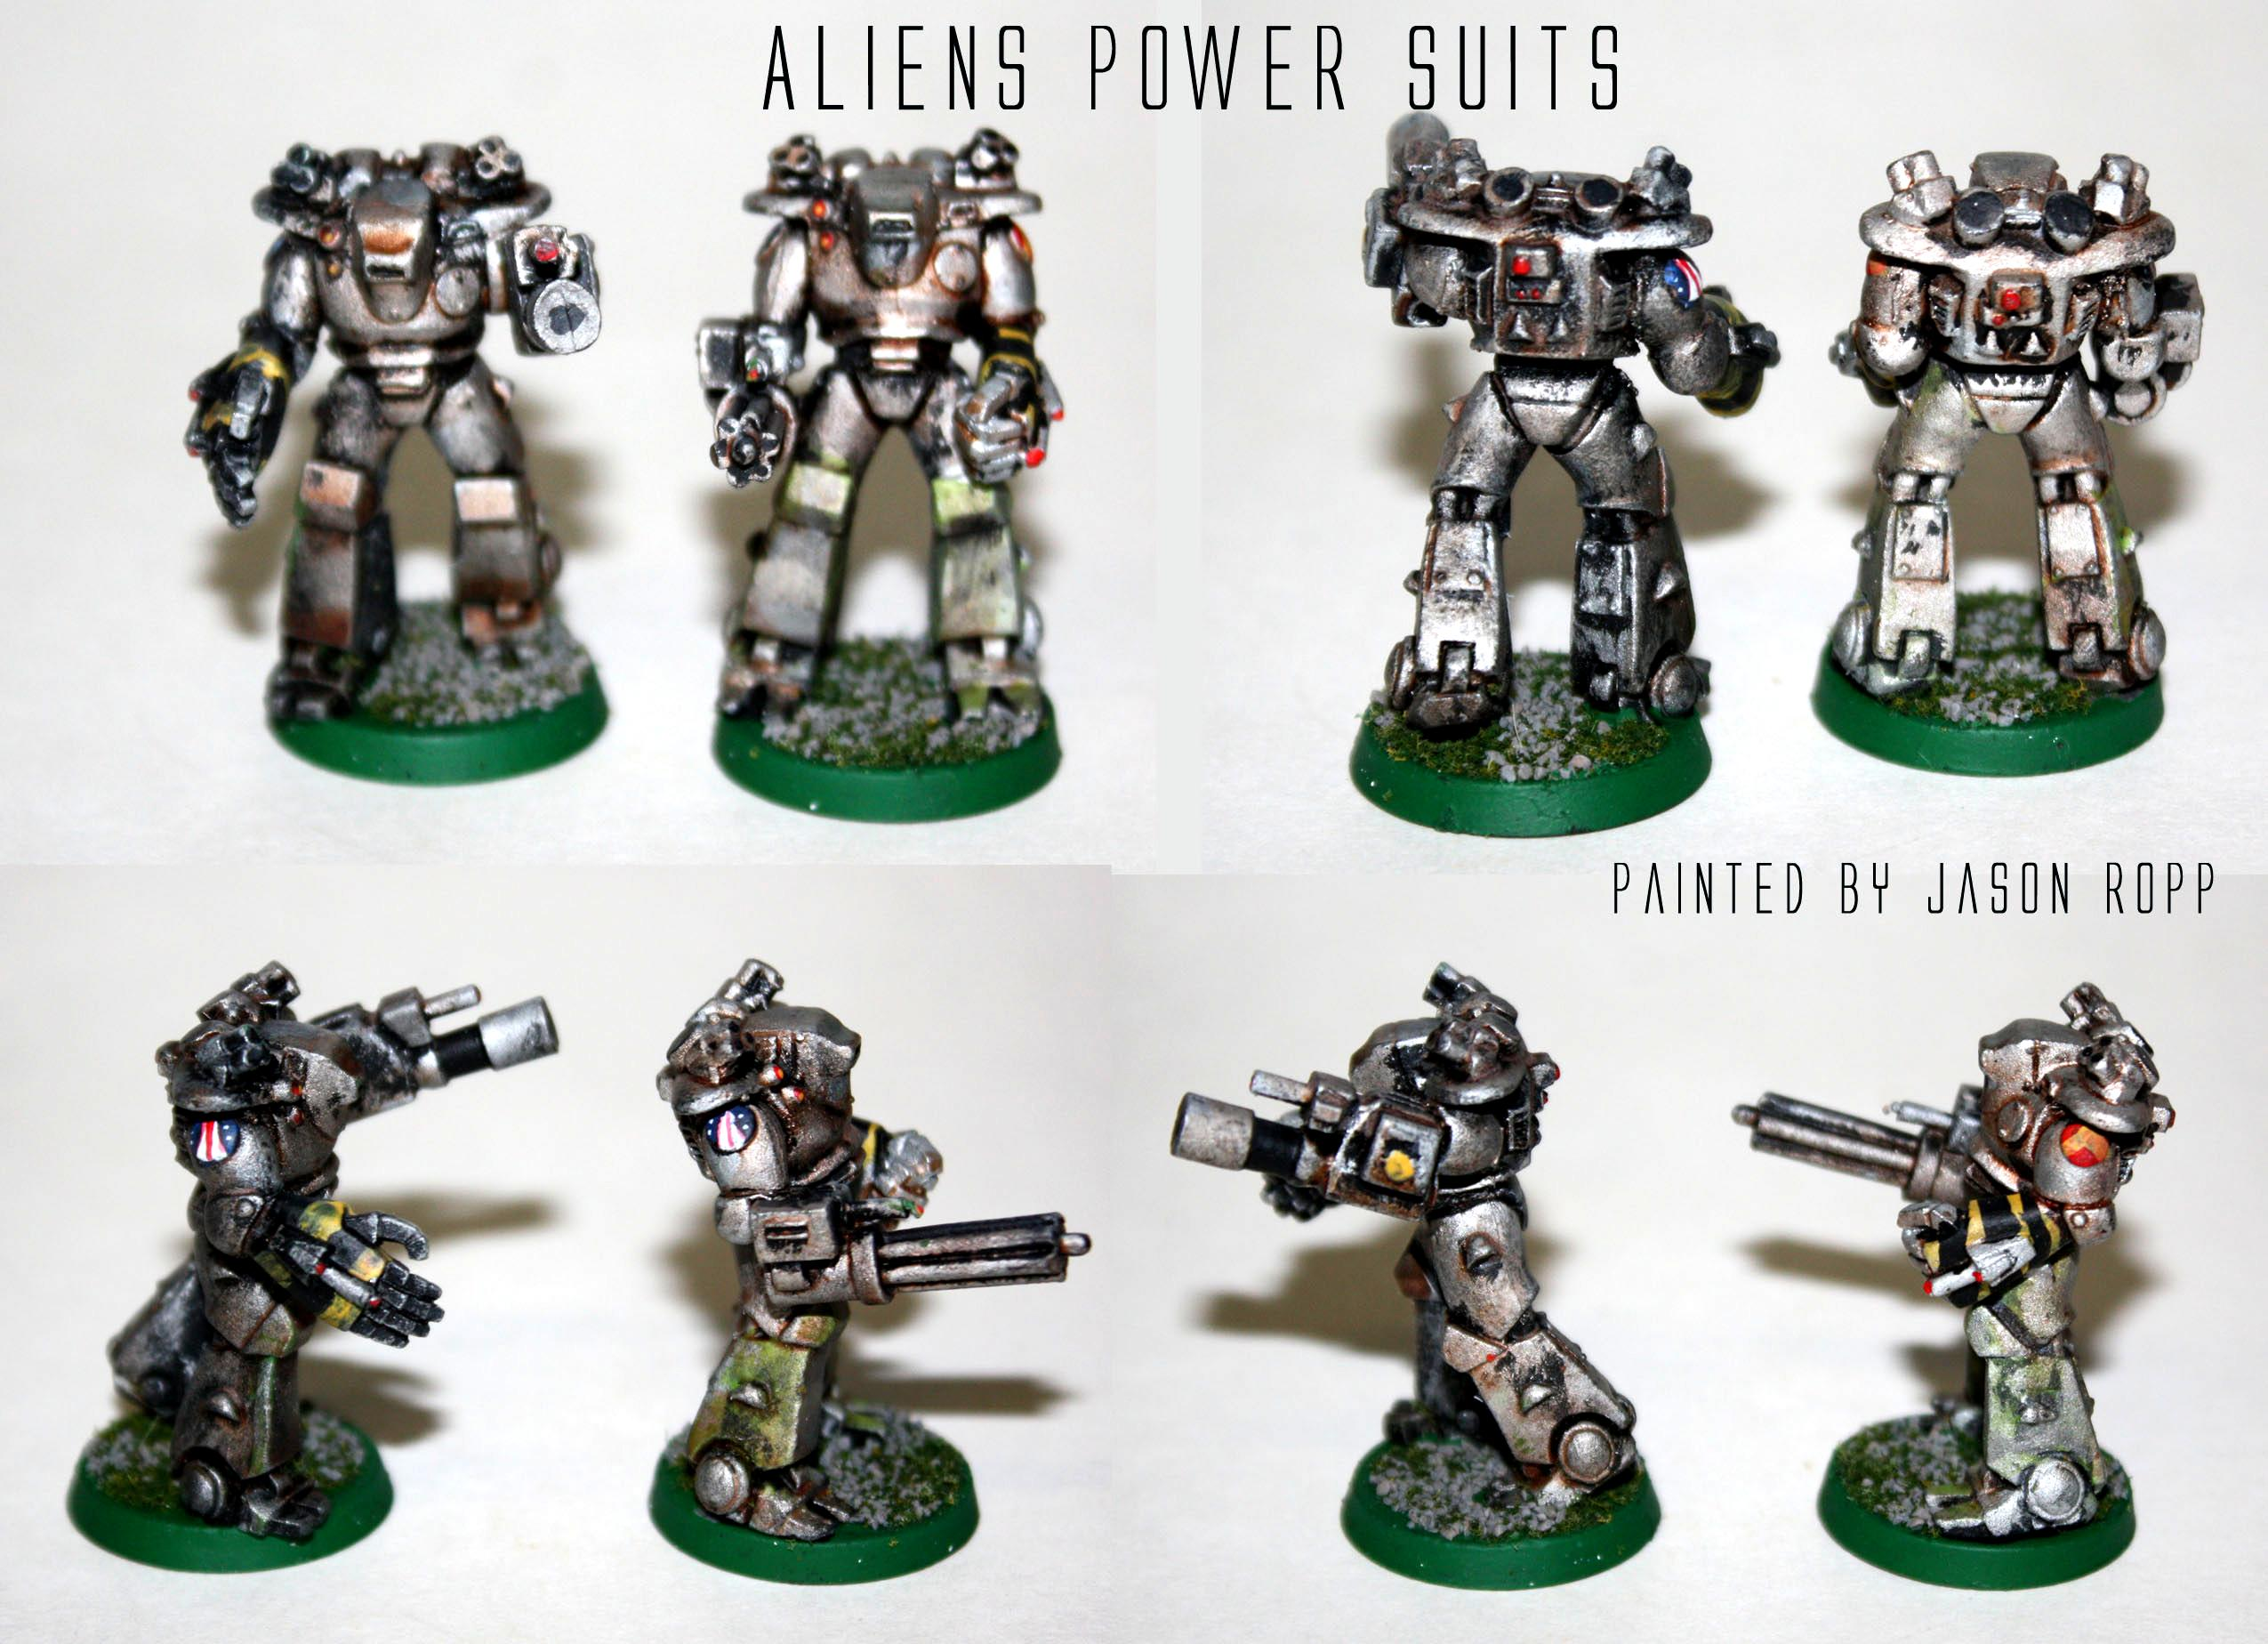 28mm, Alien, Aliens, Avp, Game, Horrorlix, Mini, Miniatures, Power Aurmor, Predator, Prodos, Prometheus, Suits, Wargame, Warhammer Fantasy, Xeno, Xenomorph